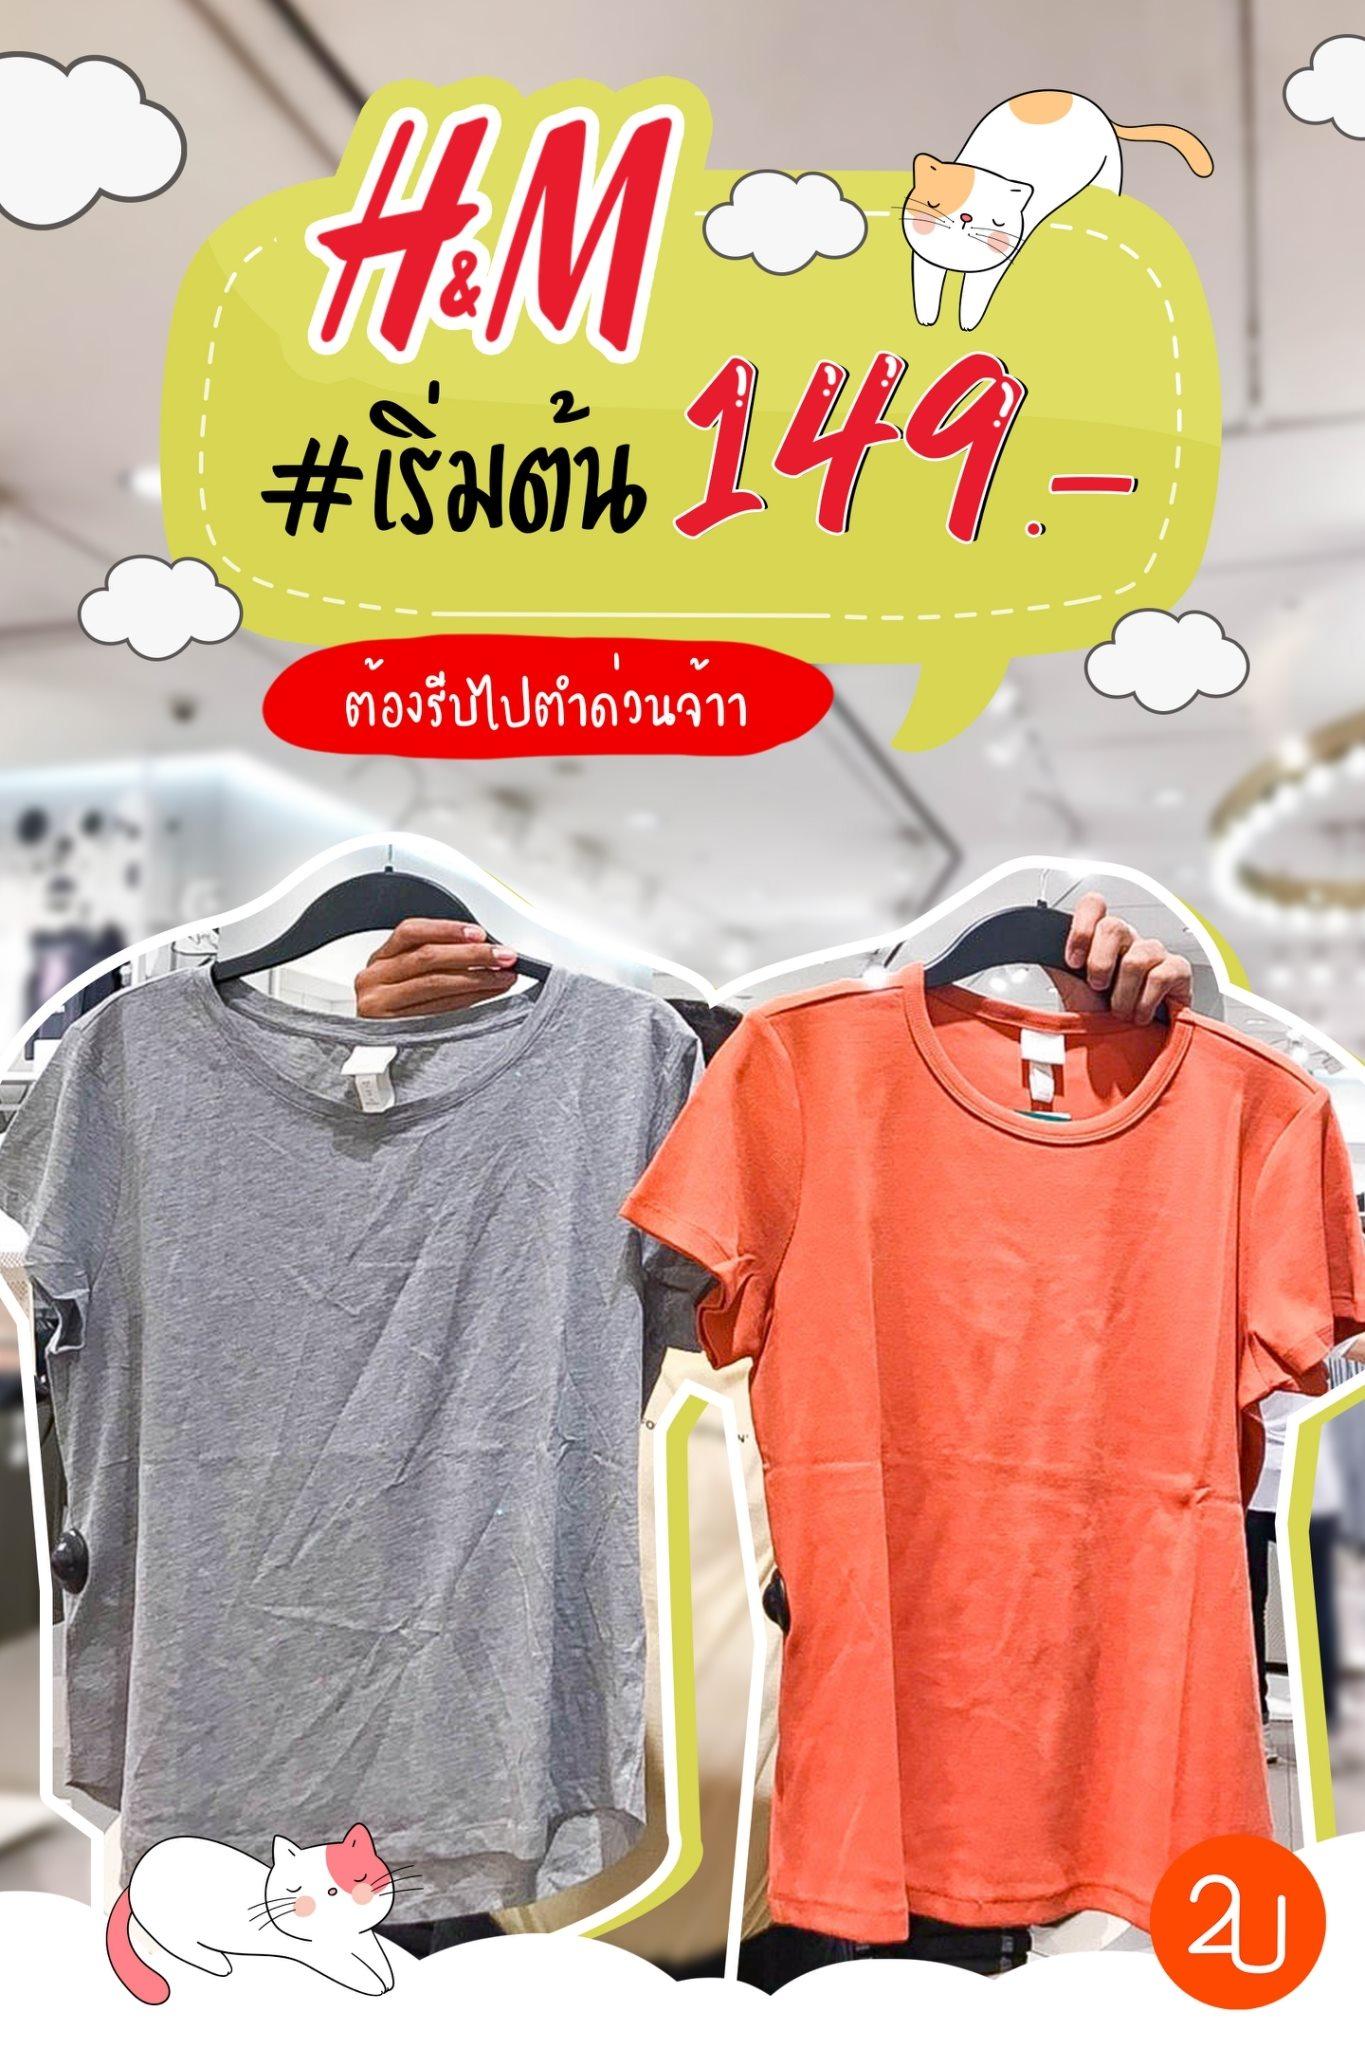 H&M cotton t-shirt start 149 bath